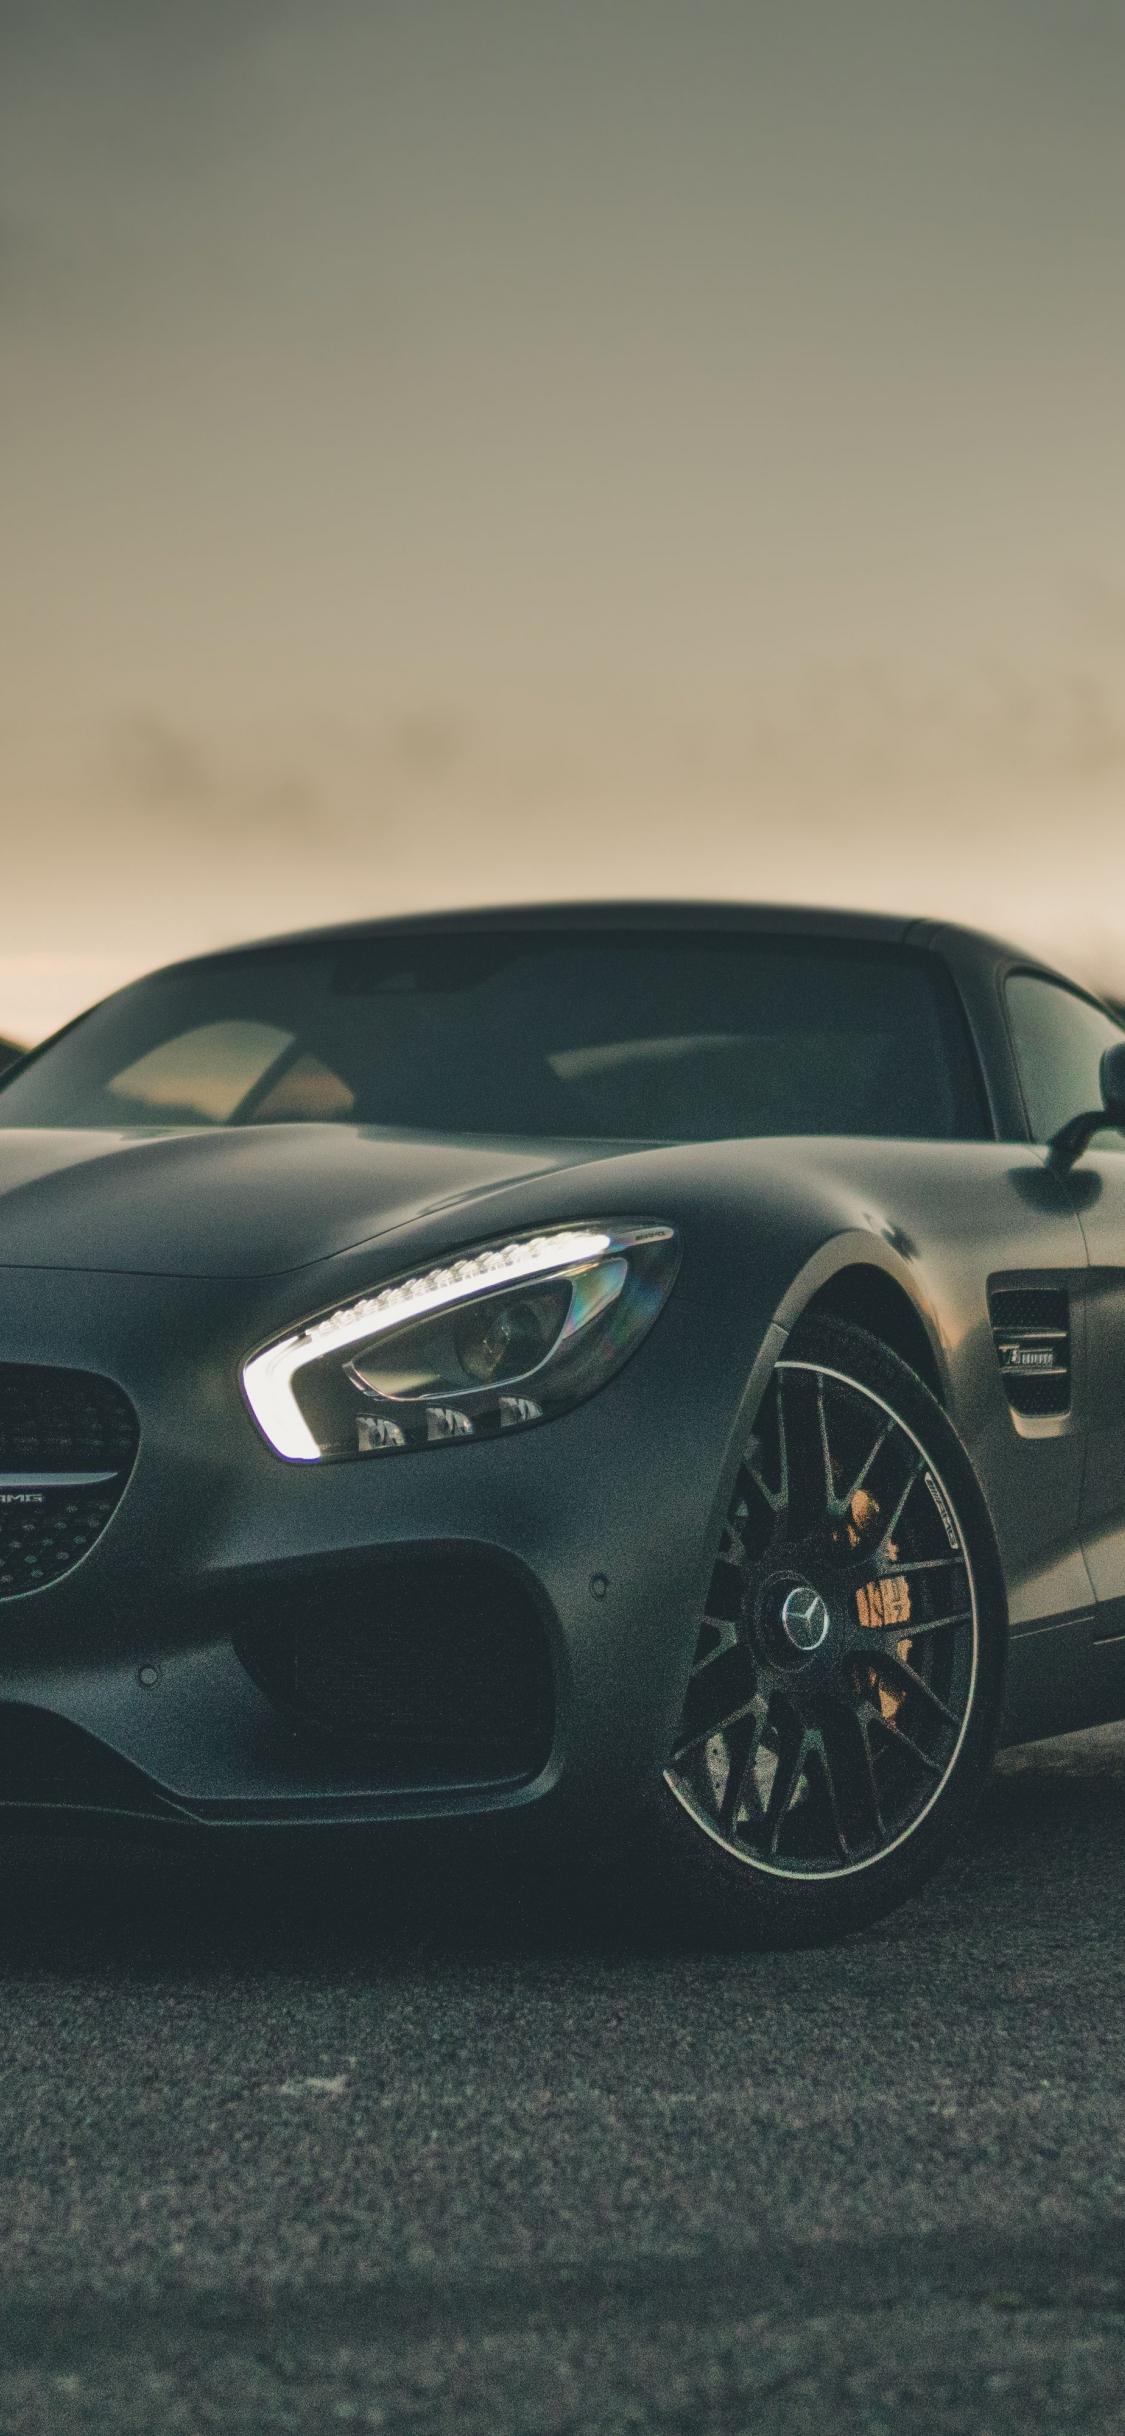 Iphone X Mercedes Amg Background